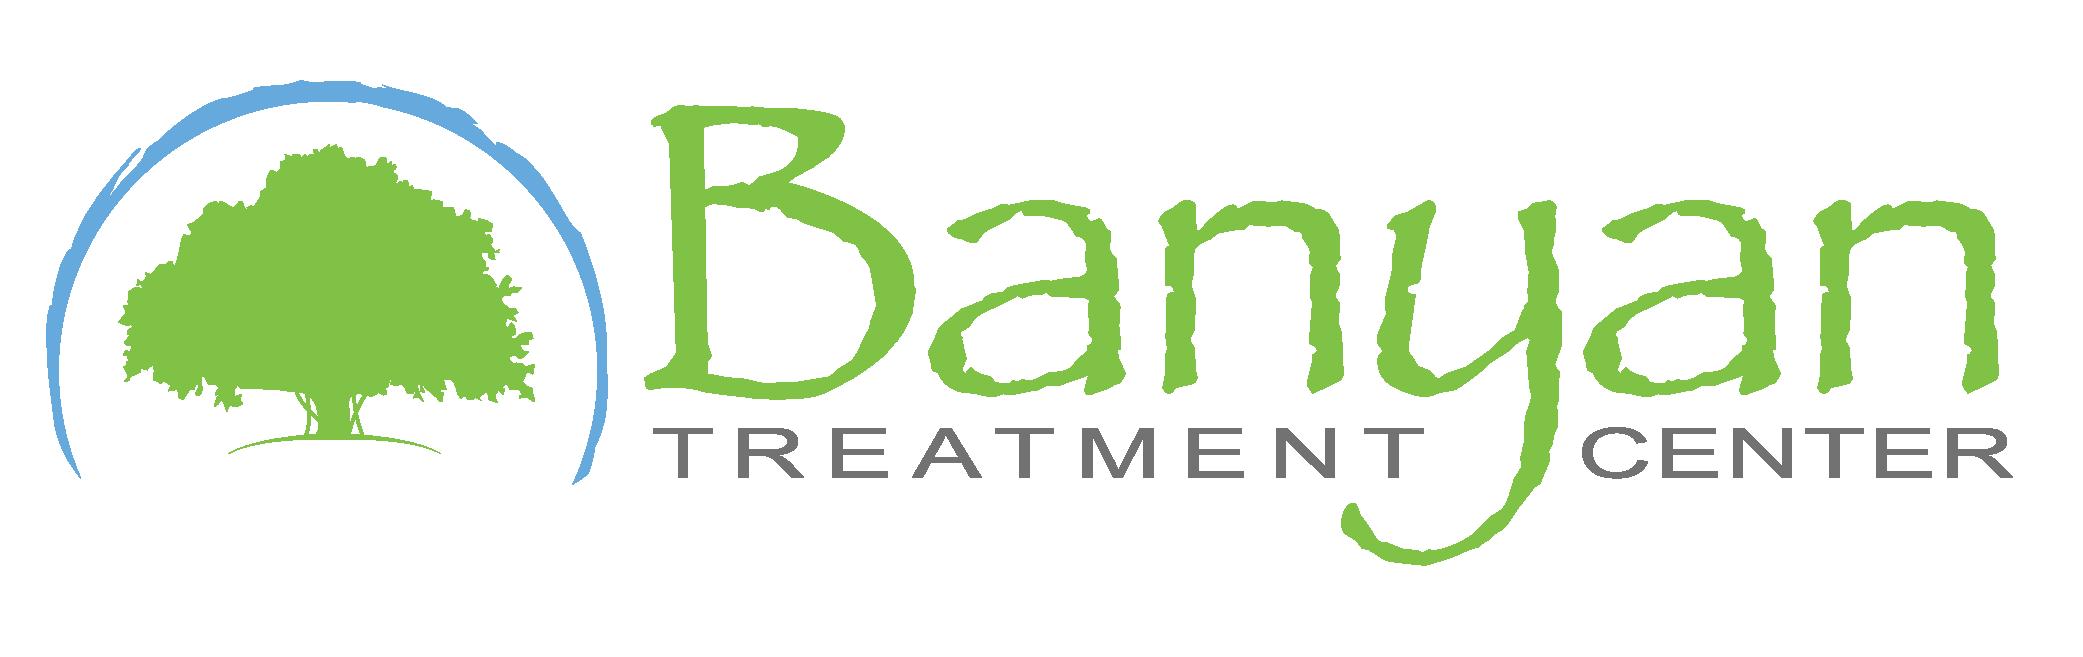 Banyan Treatment Center In Pompano Beach Florida